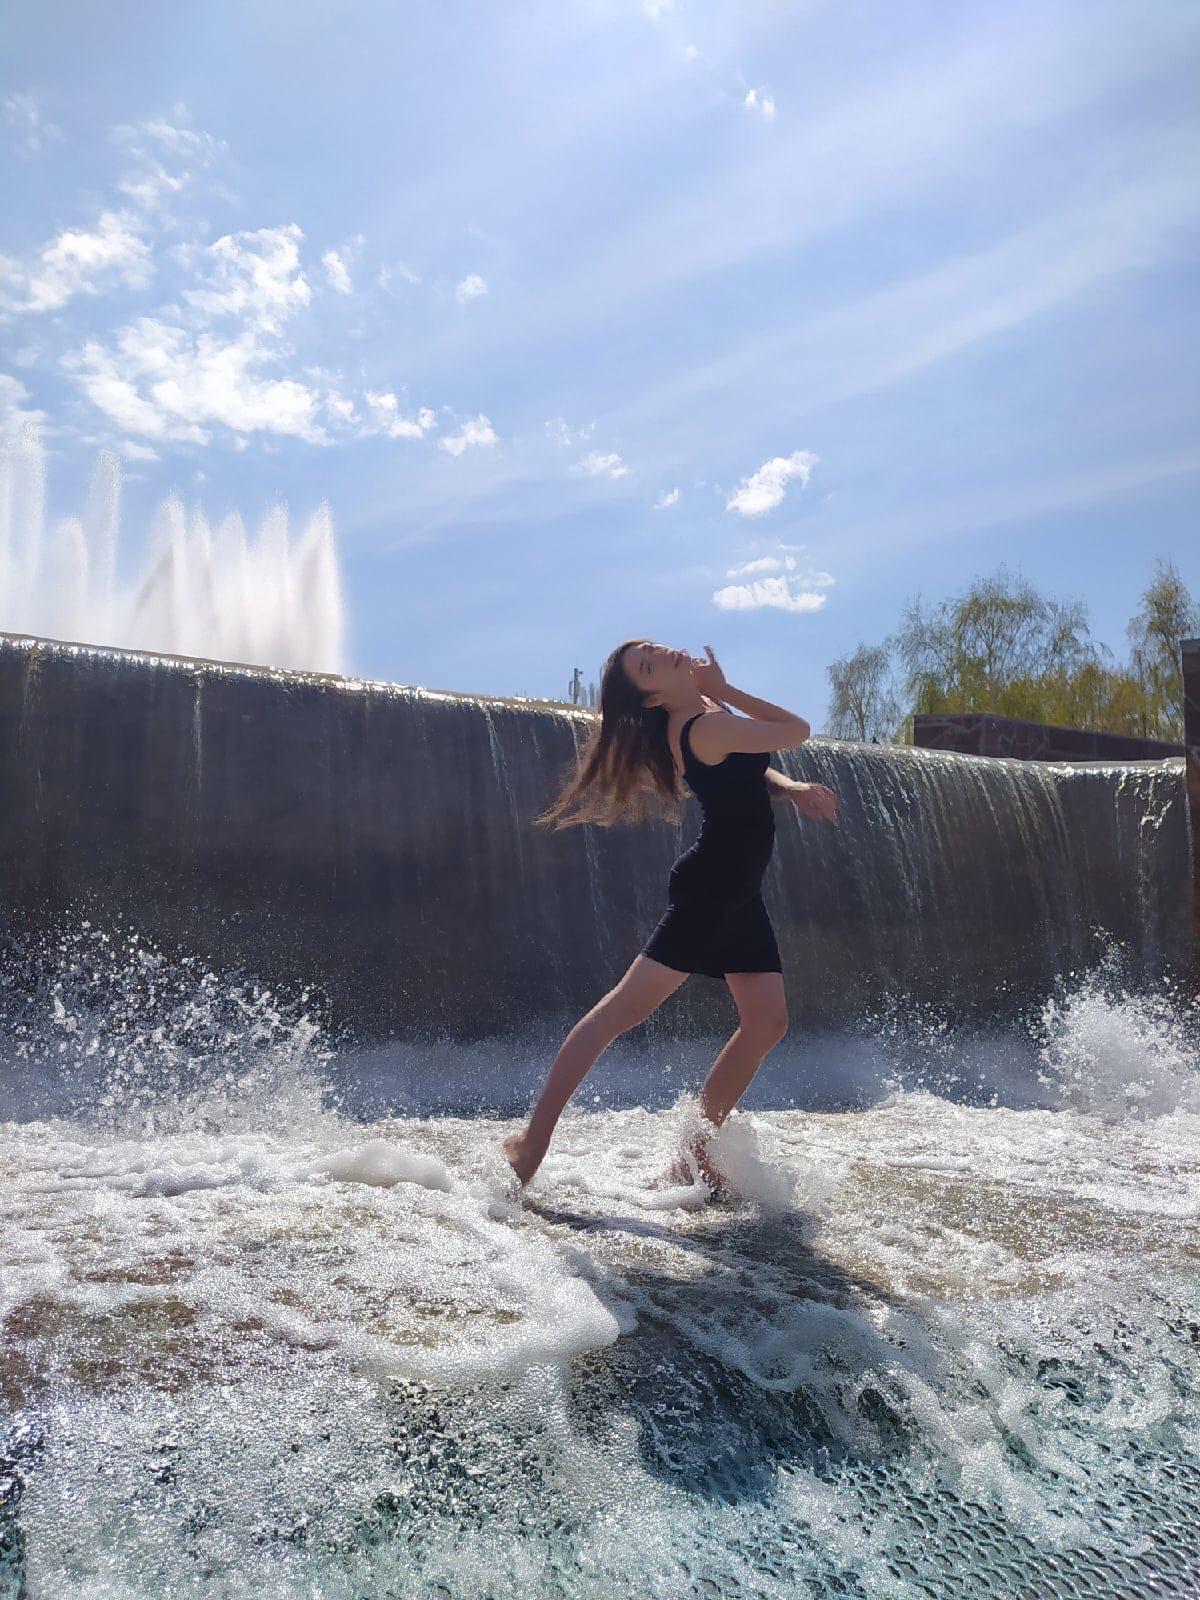 В Самаре девушка станцевала танго в фонтане на Осипенко